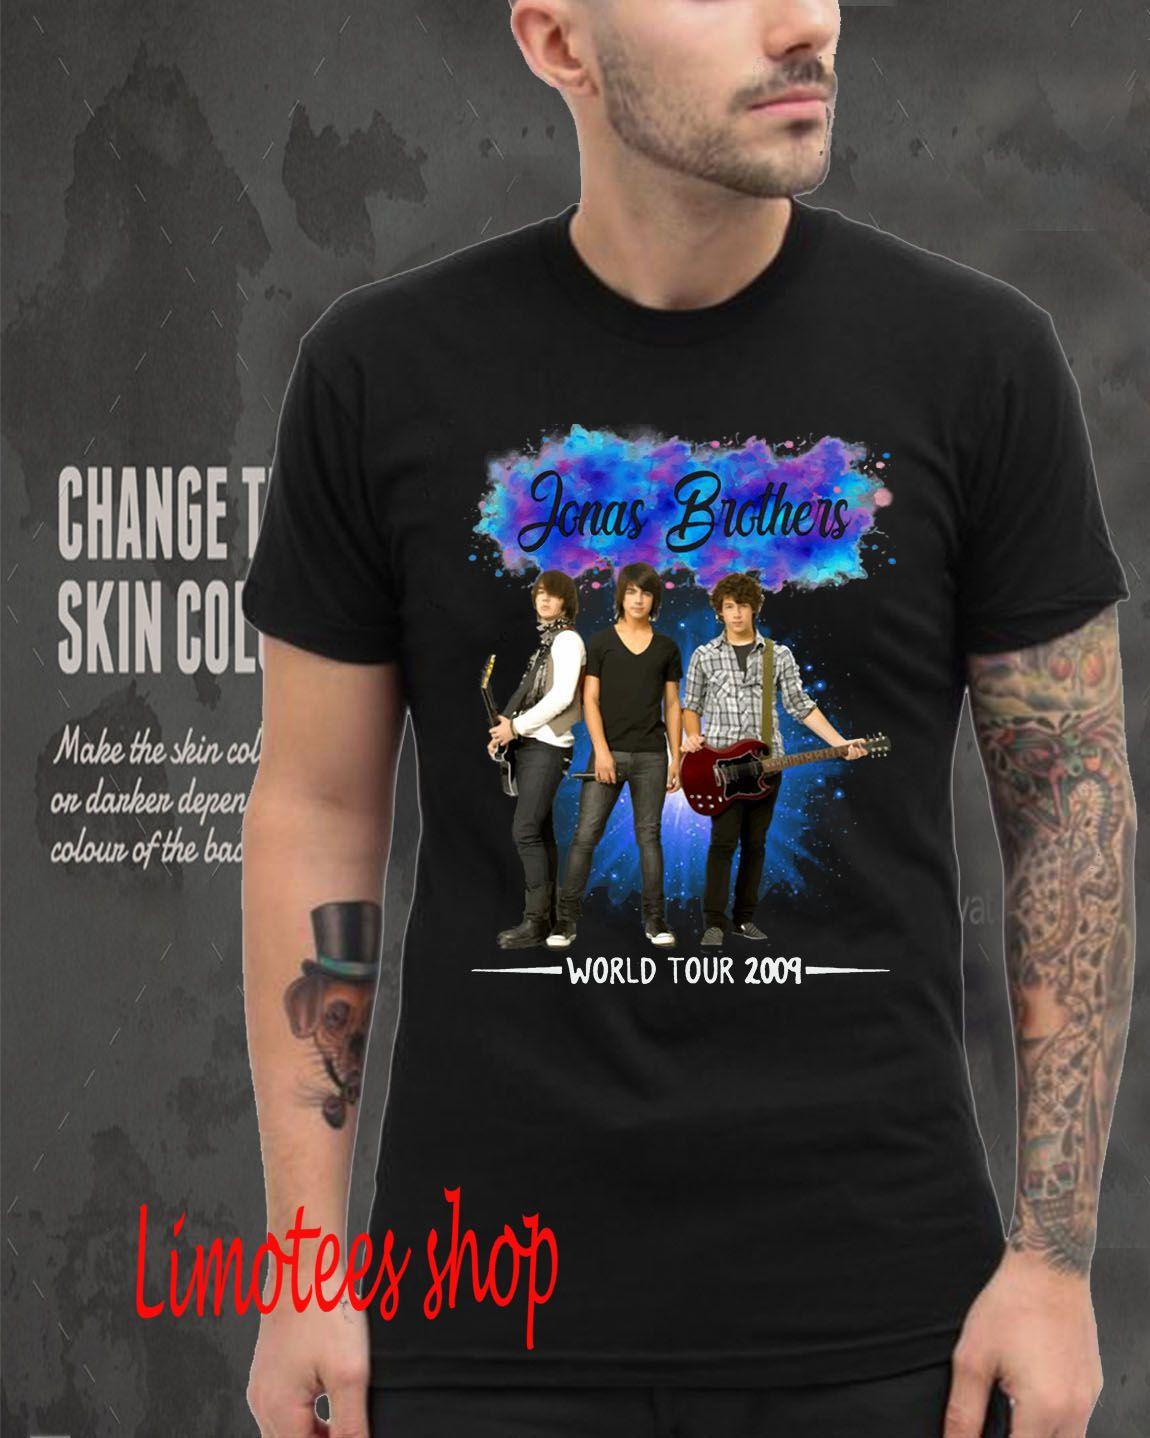 Sweatshirt Women Young Hoodie John Stamos Jonas Brothers World Tour 2009 T Shirt For Men